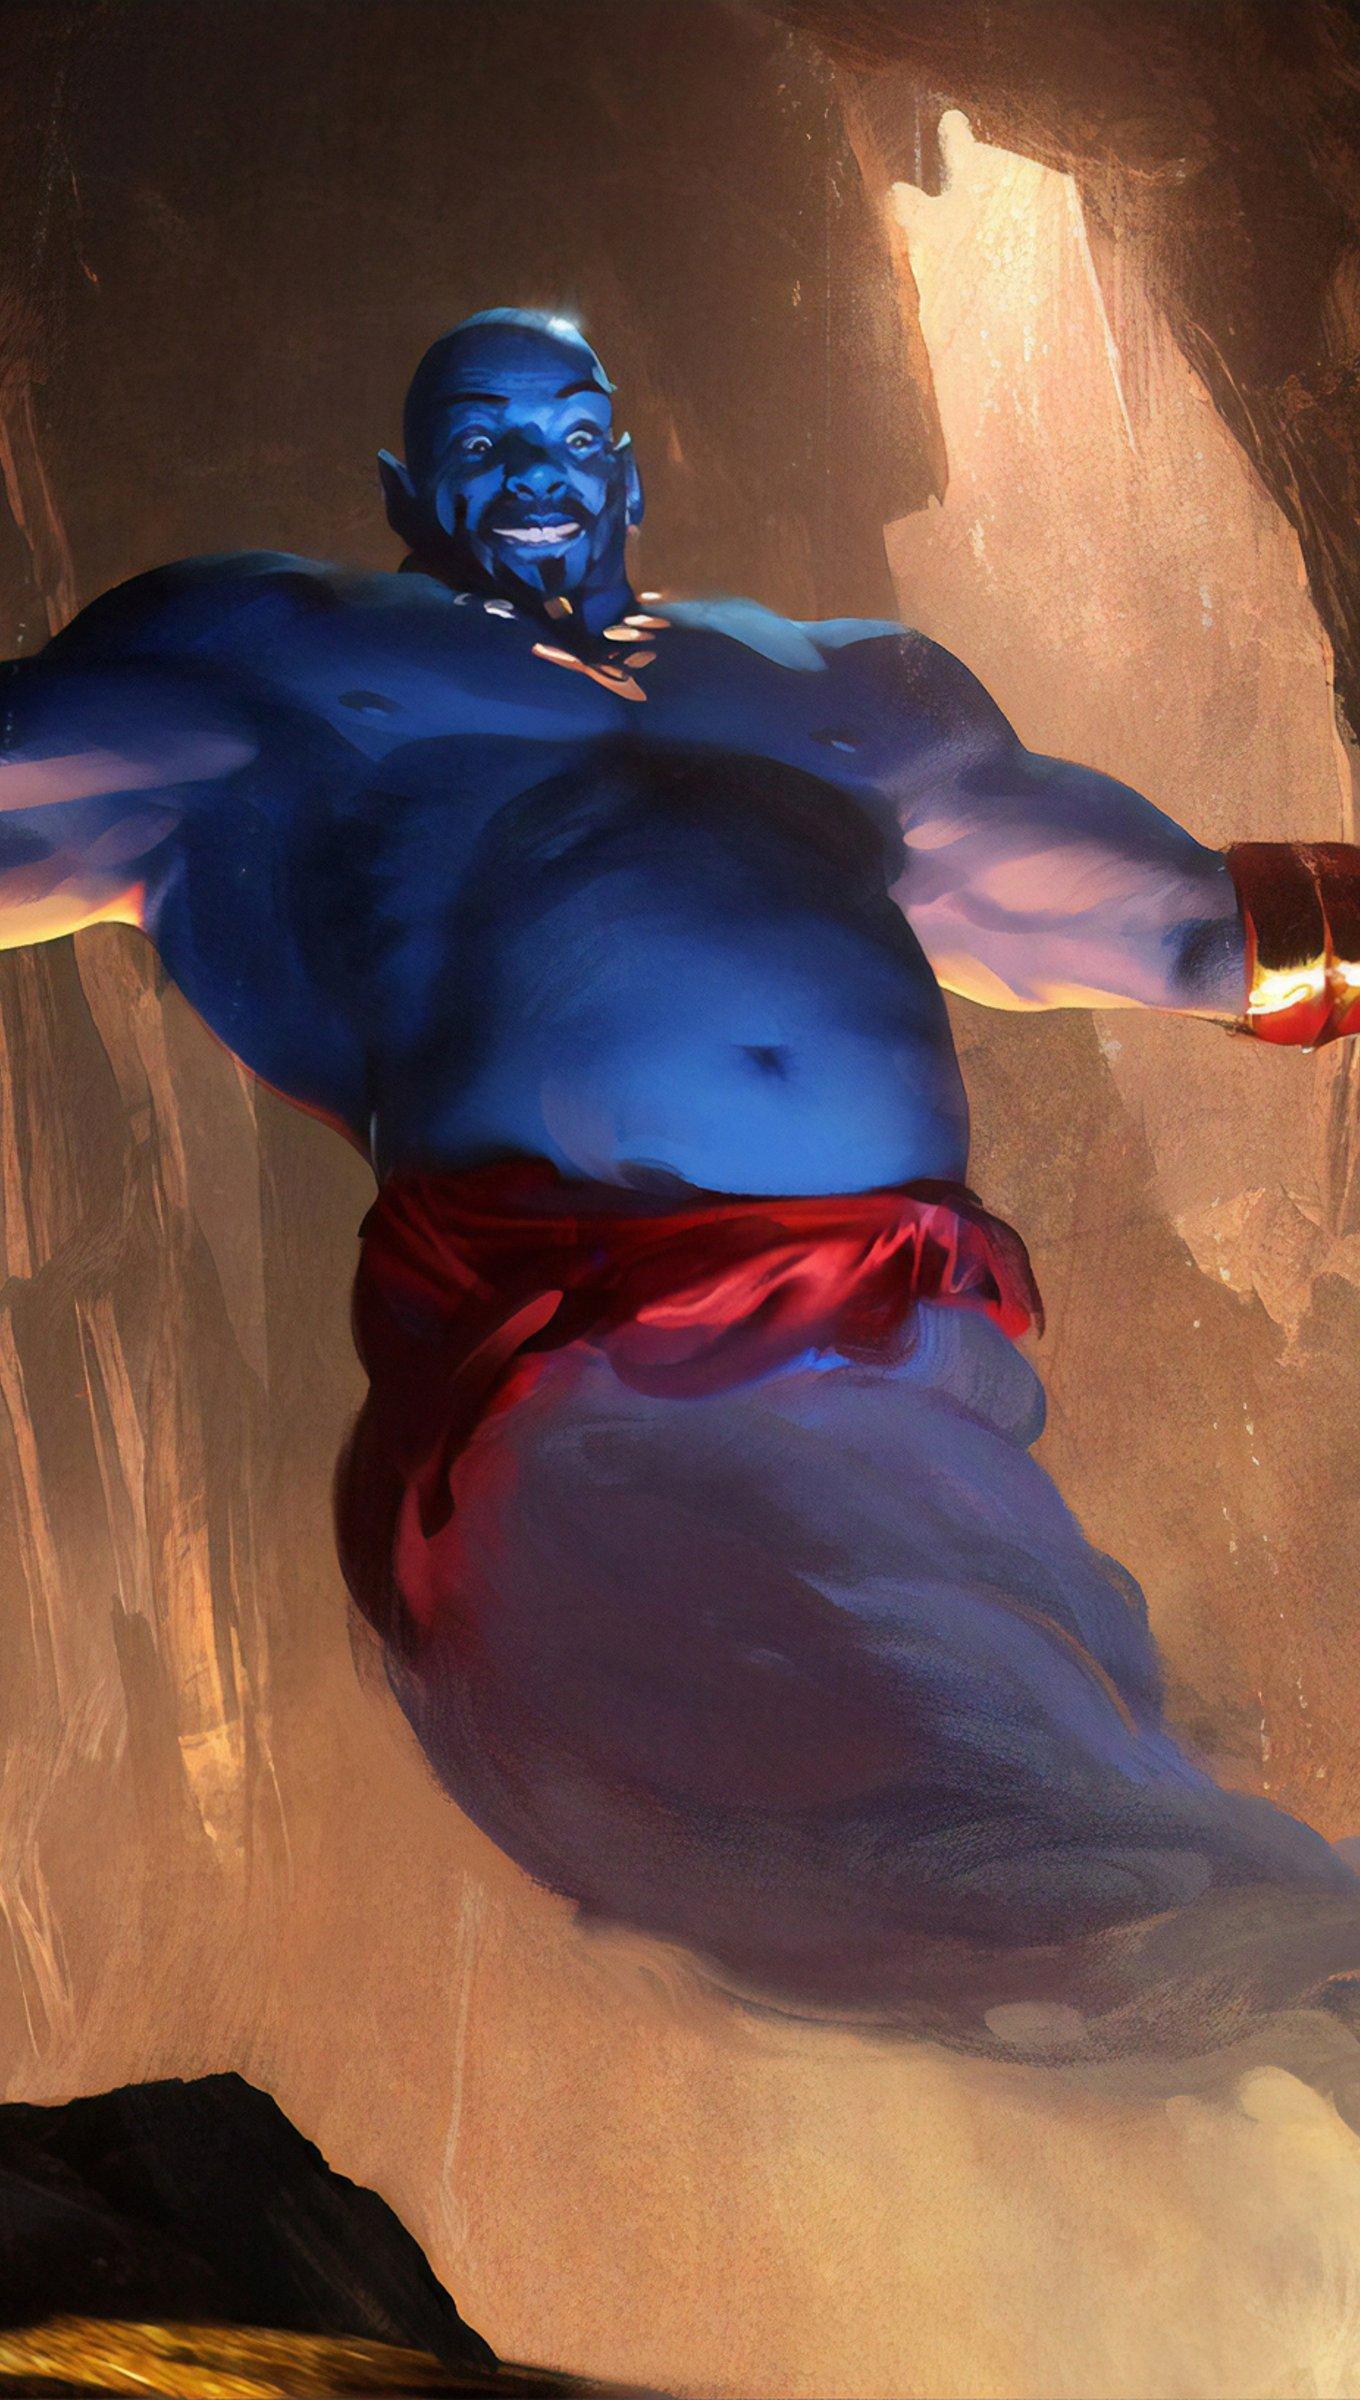 Fondos de pantalla Arte de la película de Aladdin Vertical